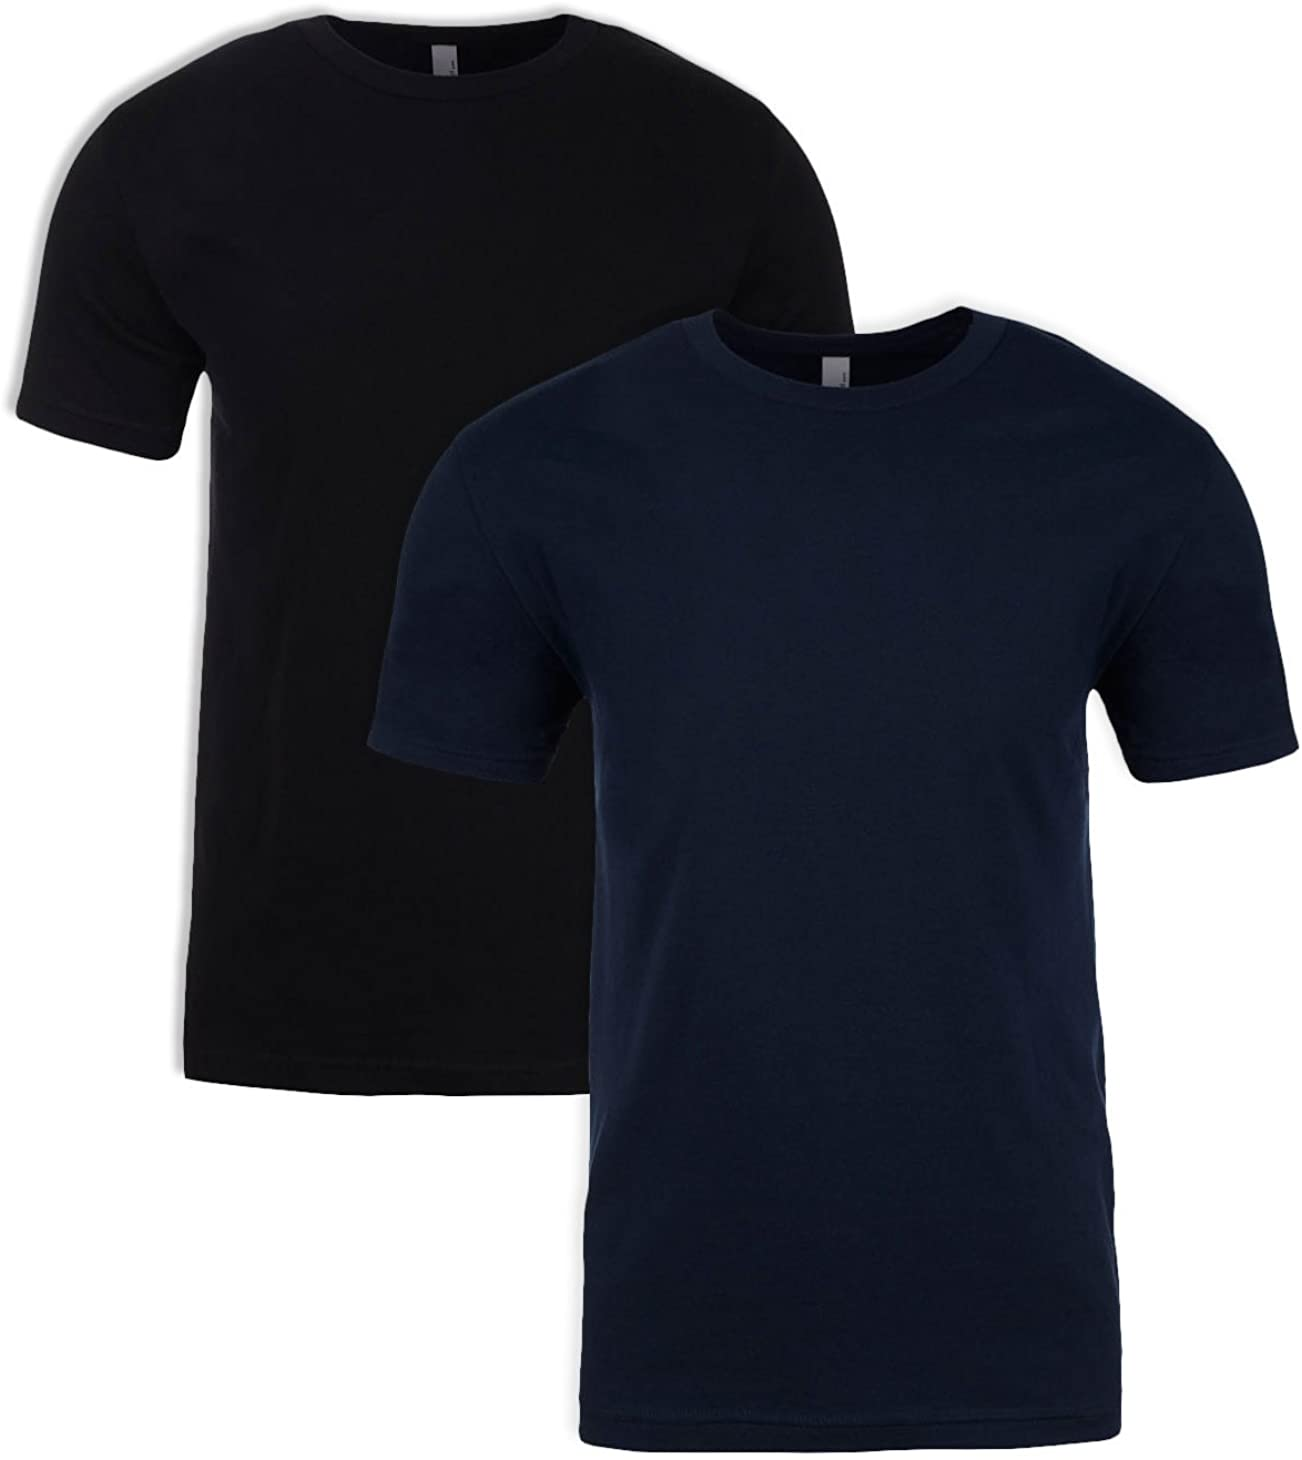 Next Level N6210 T-Shirt, Black + Midnight Navy (2 Pack), X-Small